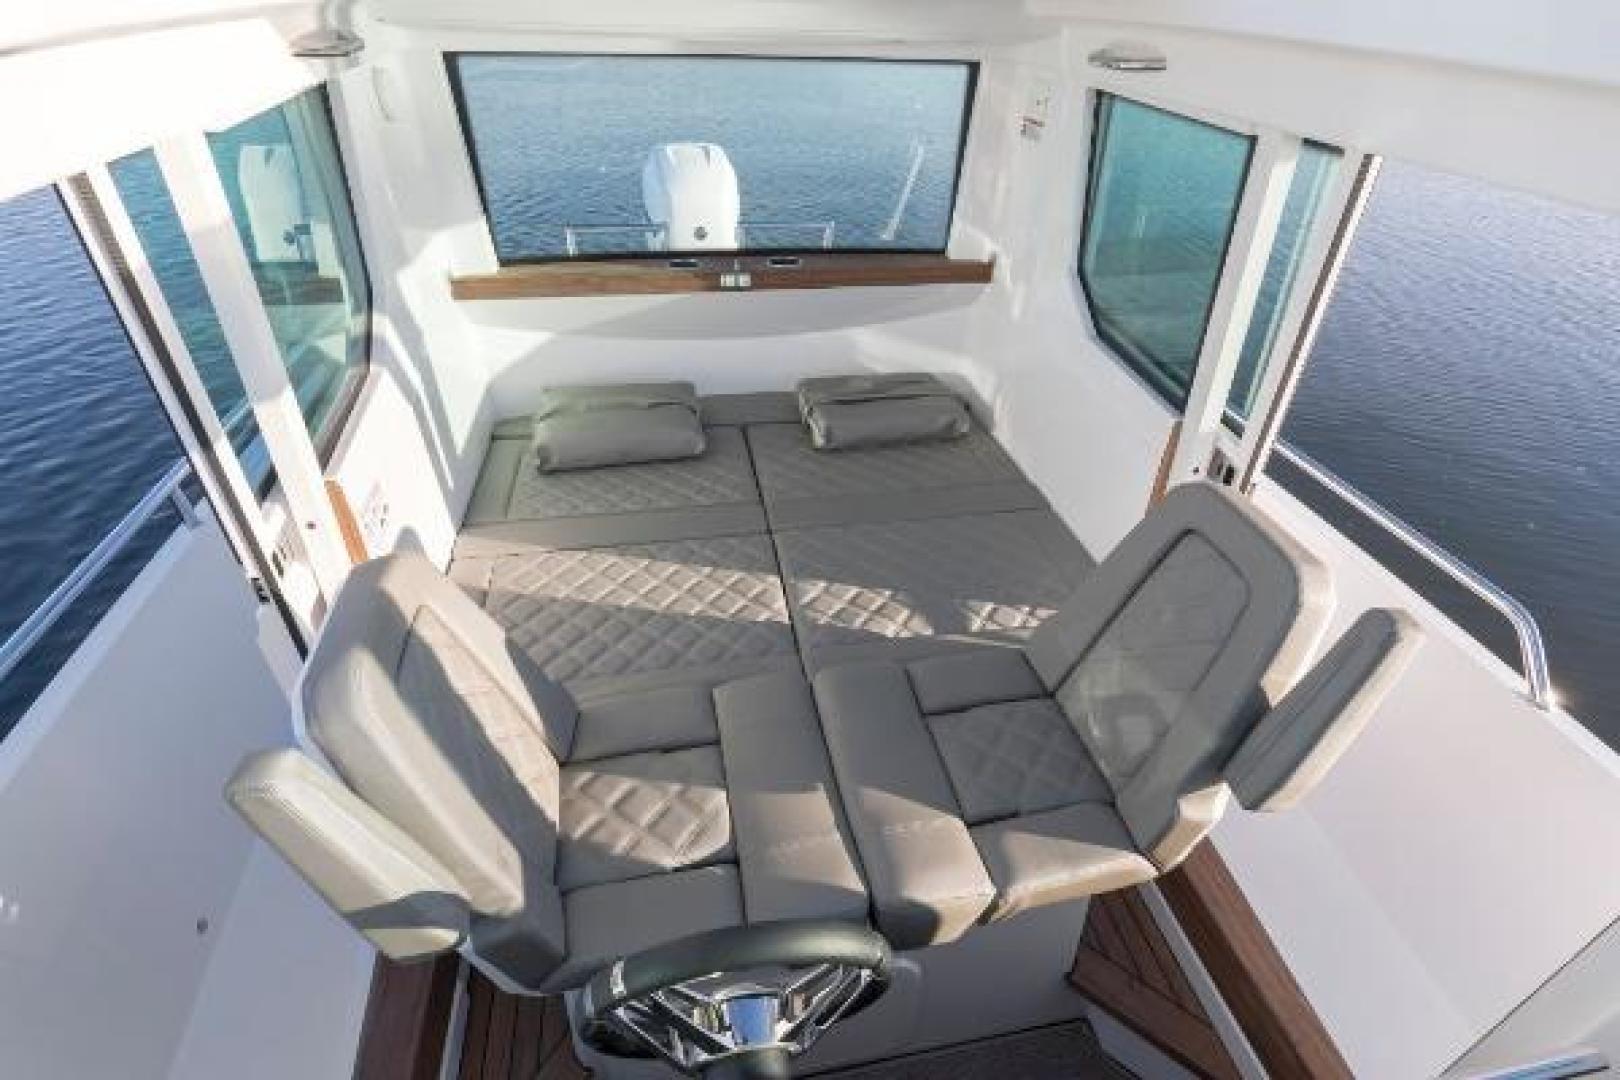 Axopar-28 CABIN 2020-Axopar 28 CABIN Sarasota-Florida-United States-1531540 | Thumbnail